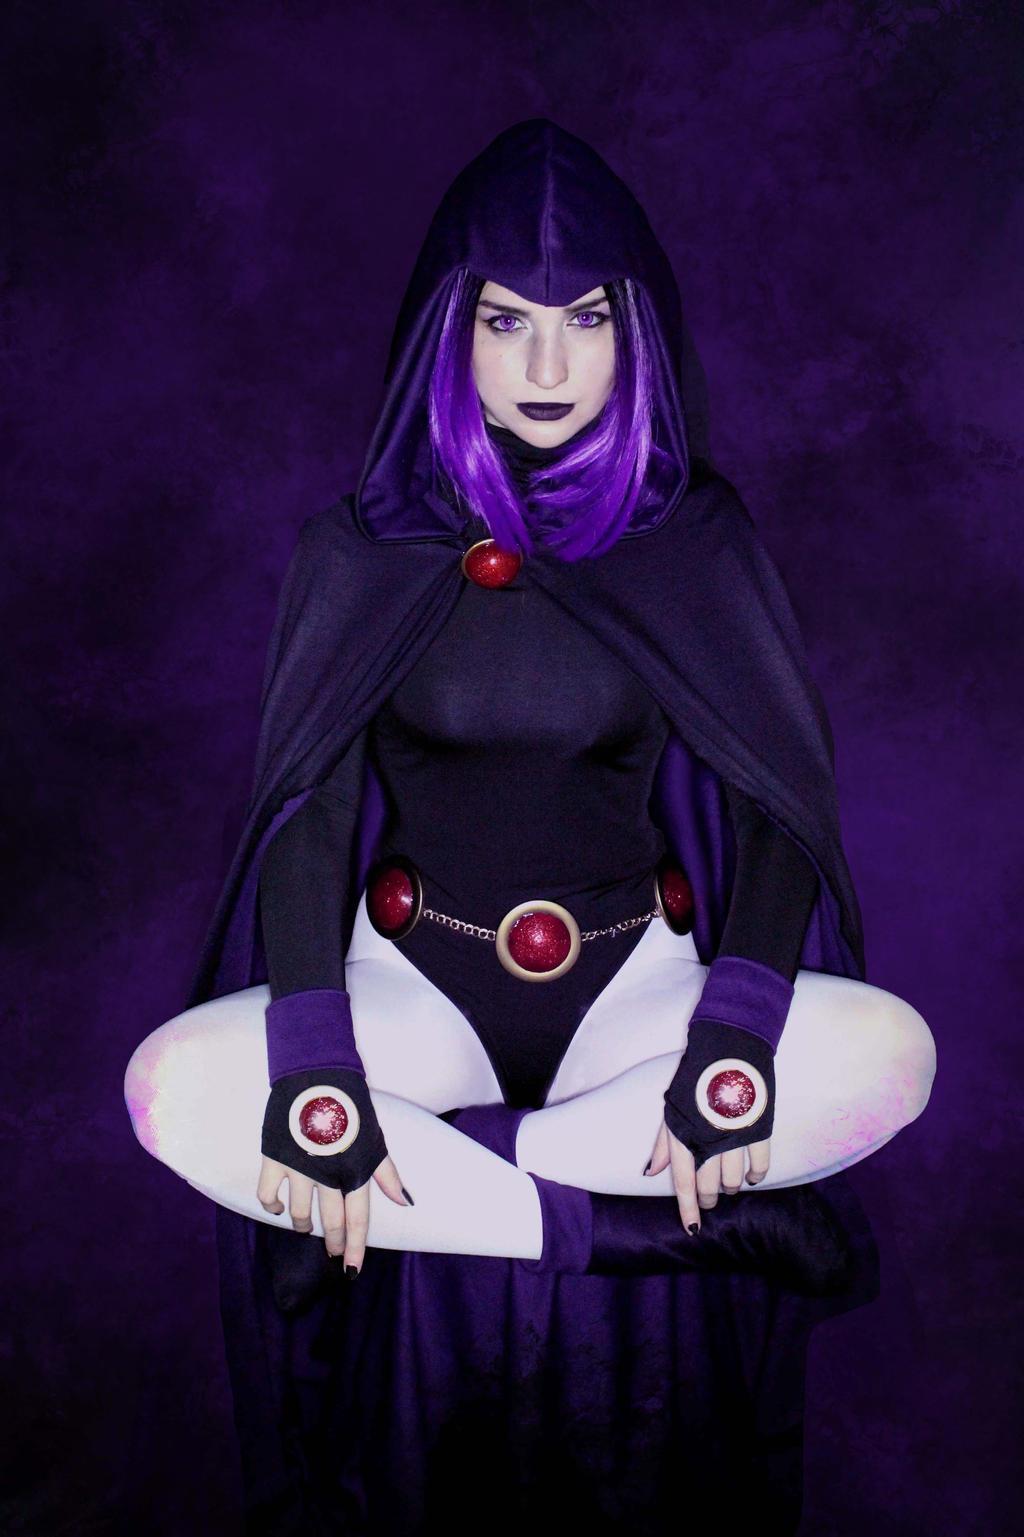 Raven Cosplay By Abyssartsandcrafts On Deviantart I like it,.but raven done got thick. raven cosplay by abyssartsandcrafts on